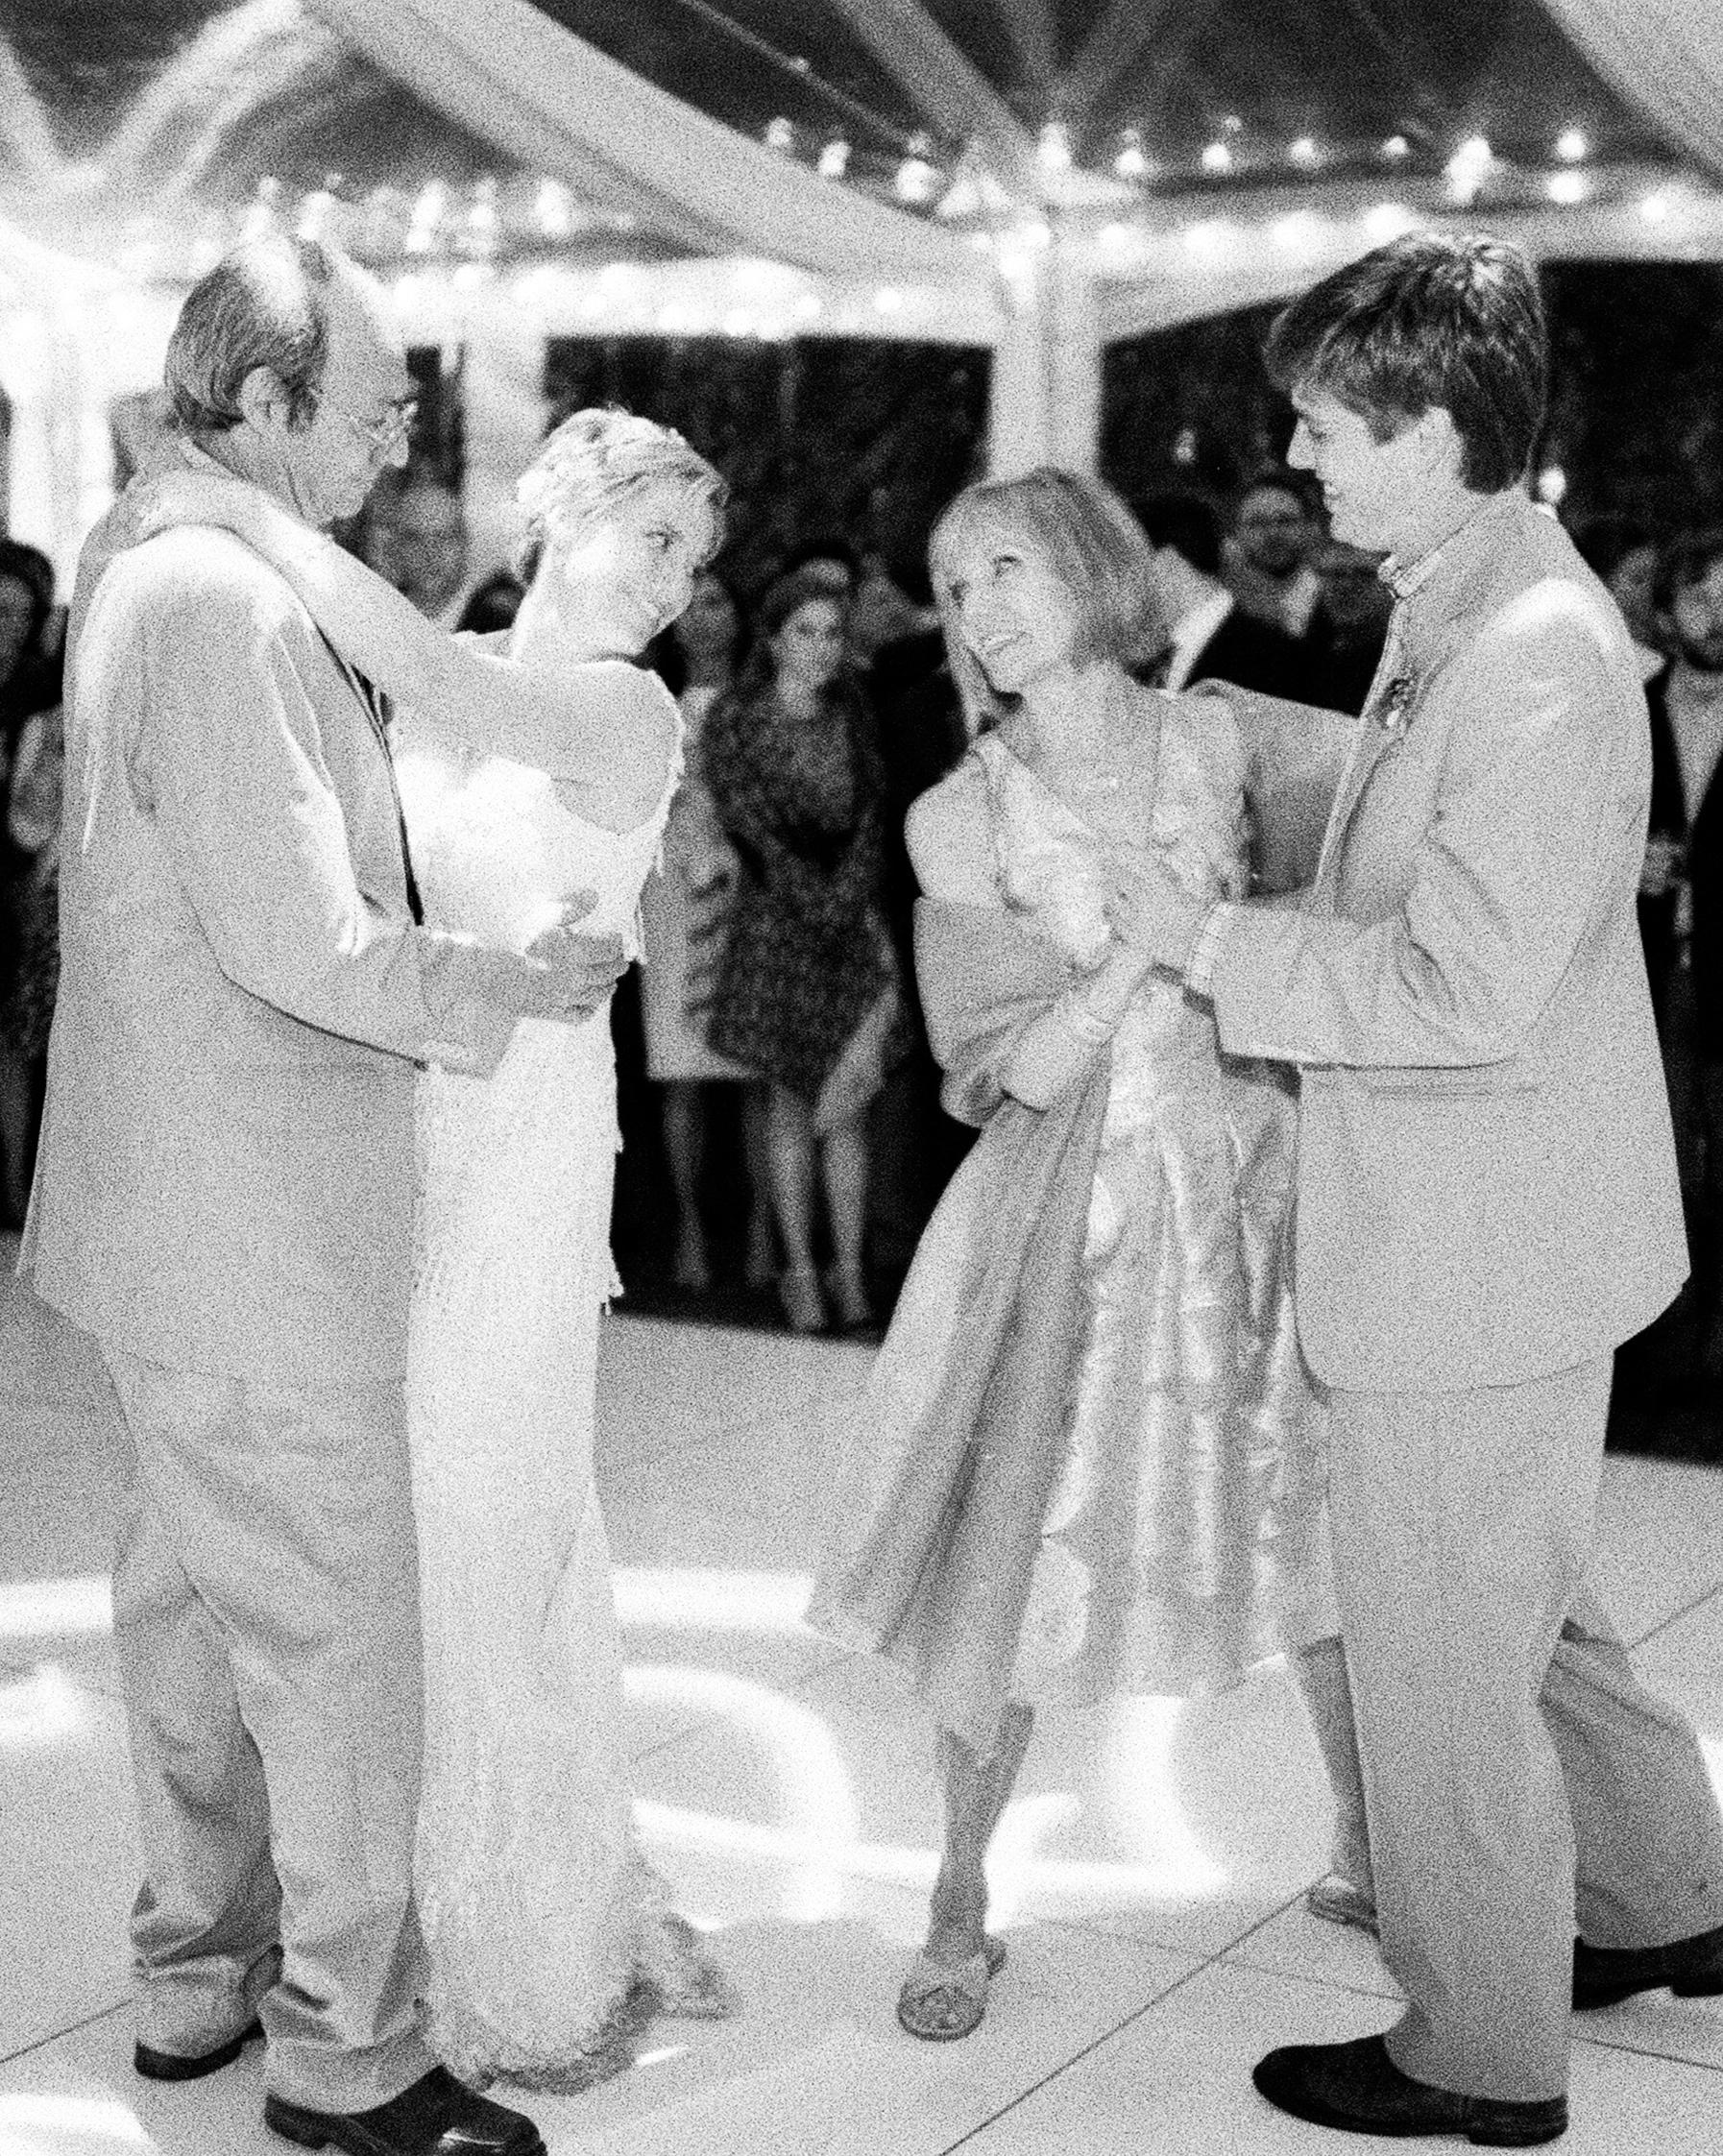 susan-cartter-wedding-dancing-13850008-s111503-0914.jpg